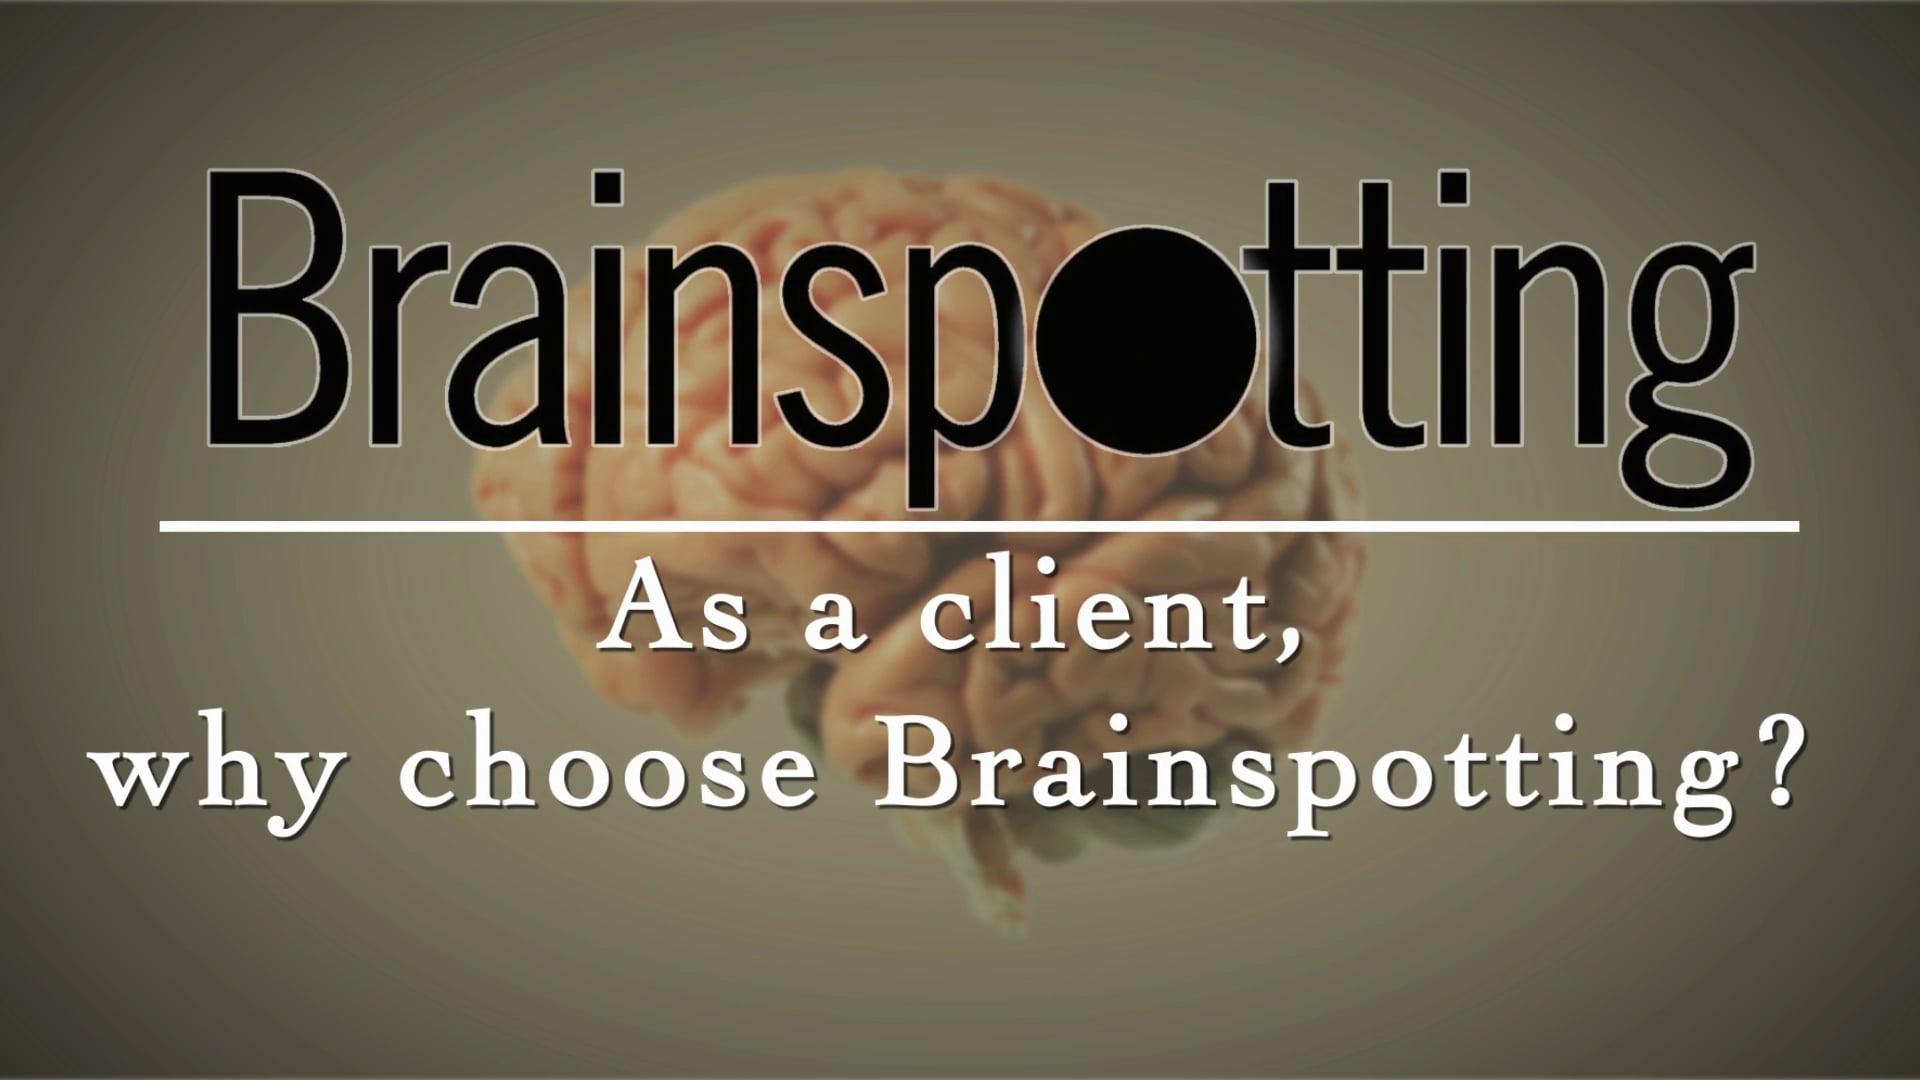 Why choose Brainspotting?